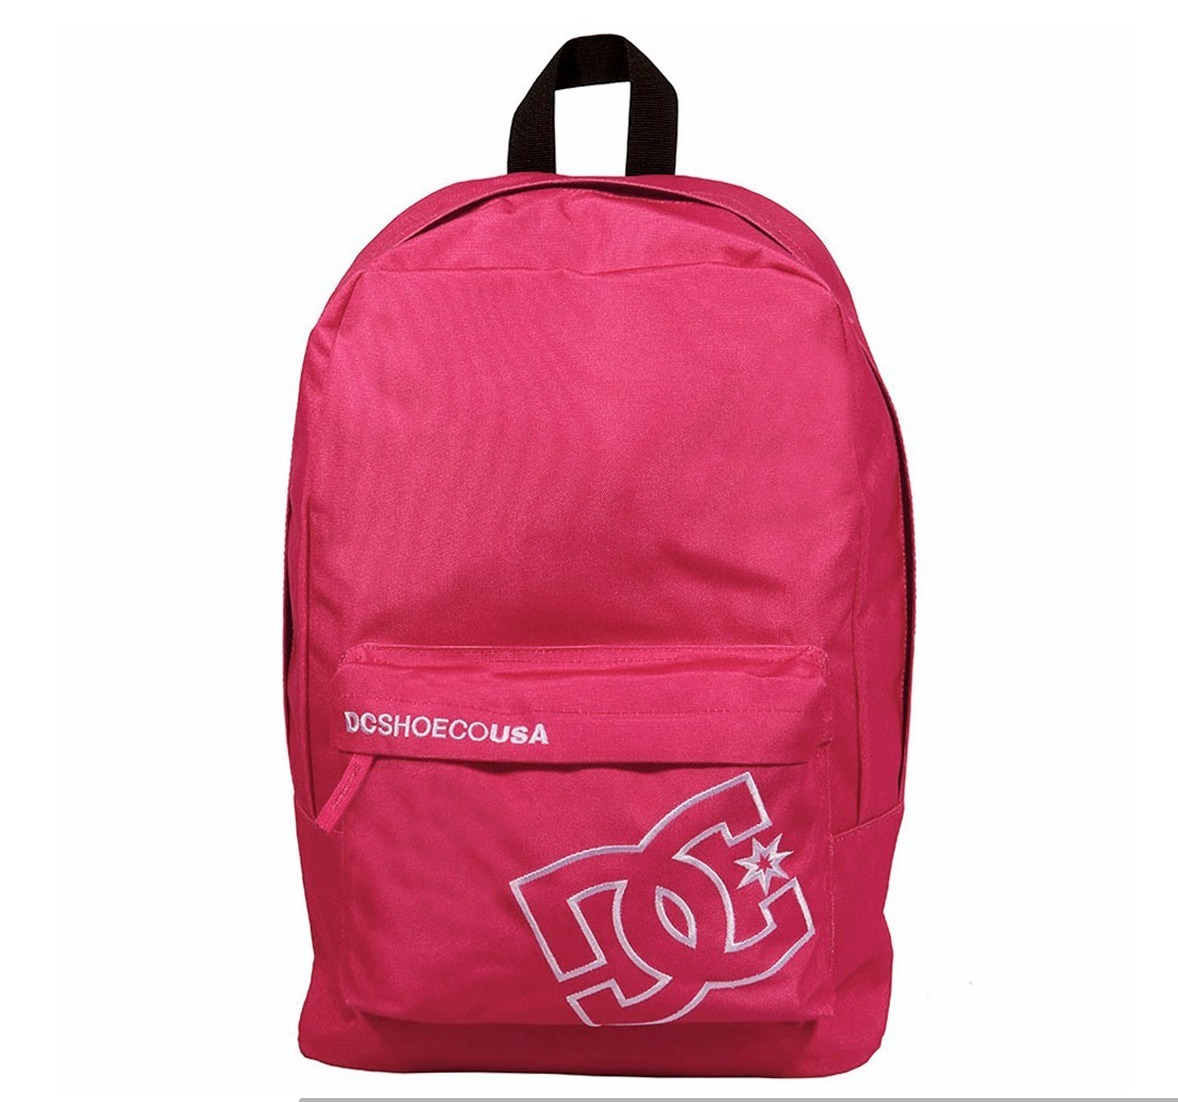 5f7ec466b5 Mochila Dc Shoes Backpack Shake Up 2 Rosa Fucsia - $ 599.00 en ...